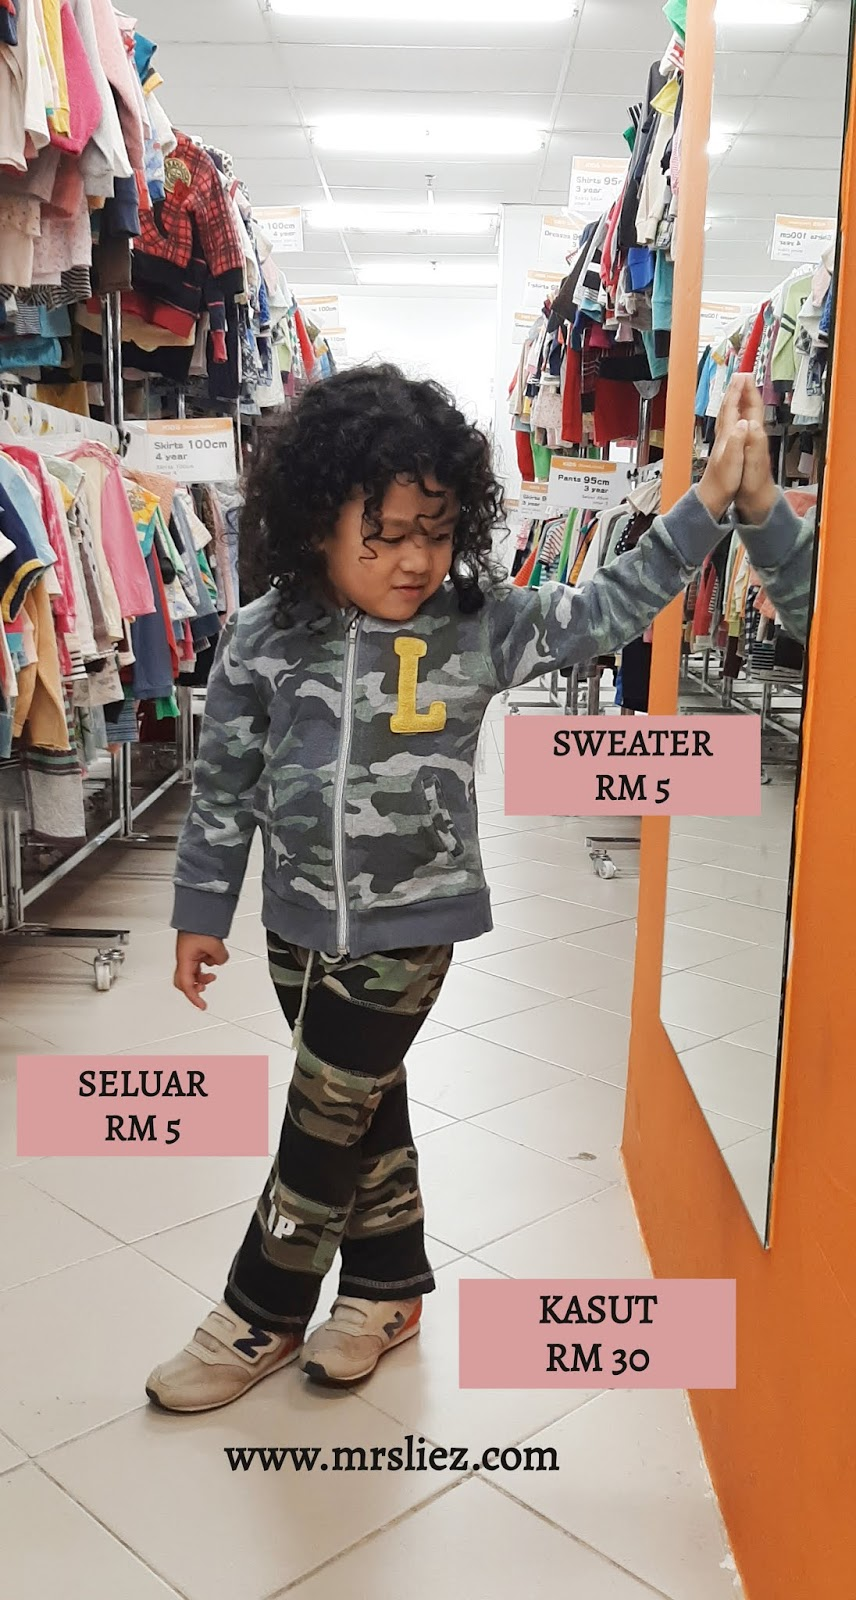 Rambang Mata Shopping Pakaian Murah Untuk Anak Anak Di Jalan Jalan Japan M3 Mall Mrsliez Com